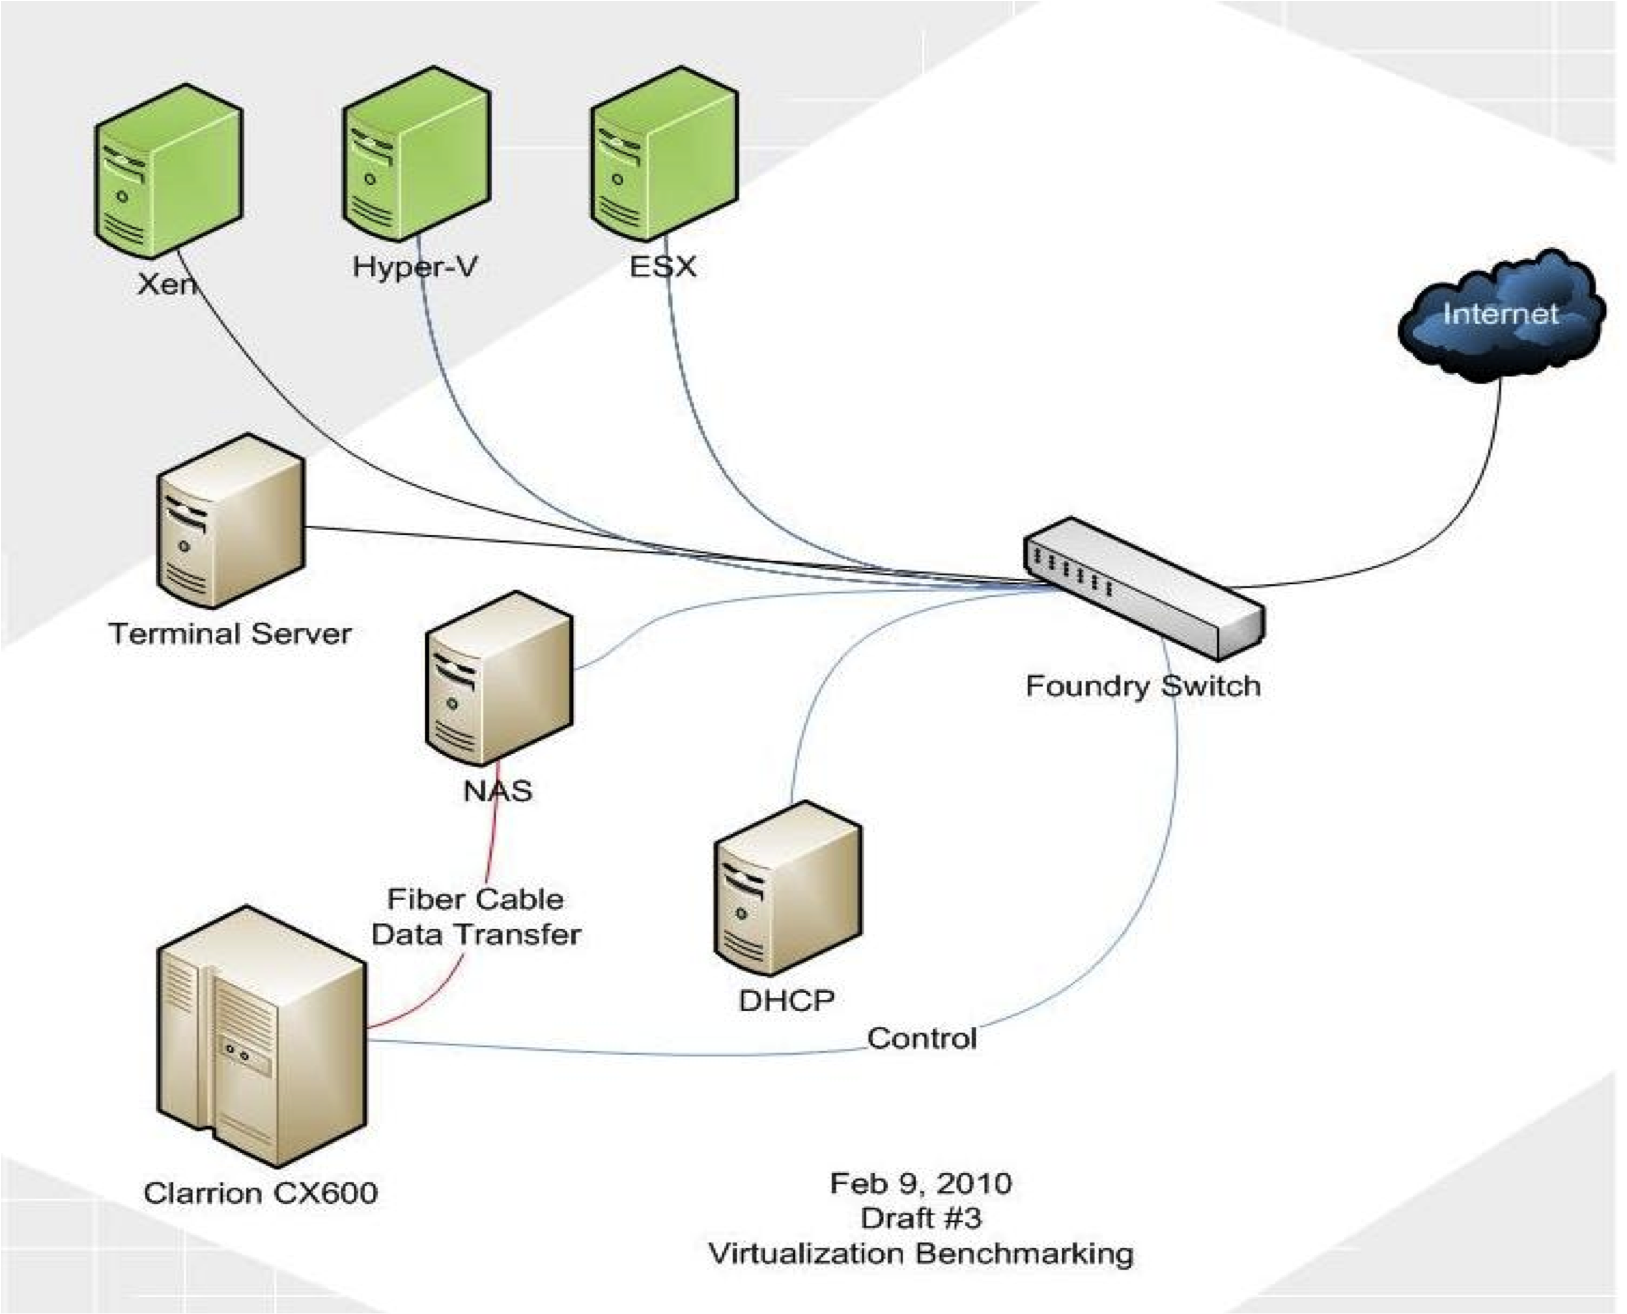 Network Diagrams Citrix Network Diagram Virtualization Benchmarking